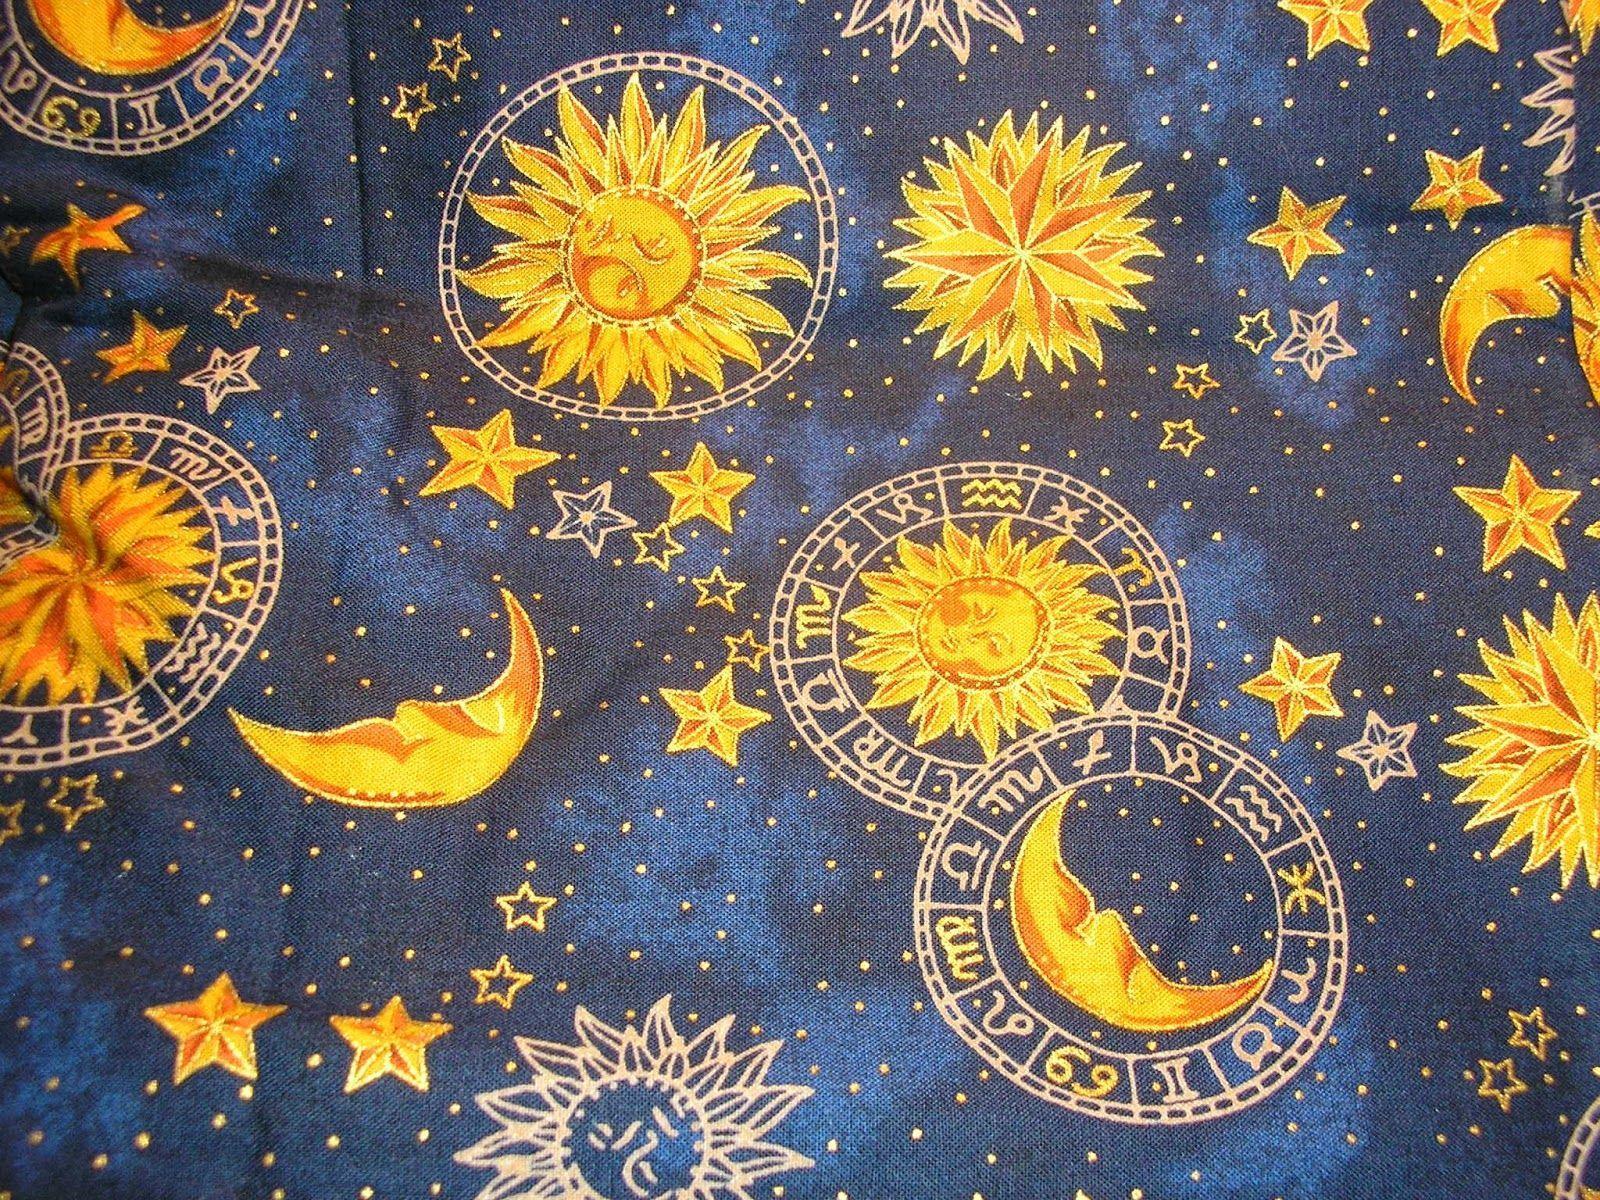 Tumblr Moon Desktop Wallpapers Top Free Tumblr Moon Desktop Backgrounds Wallpaperaccess